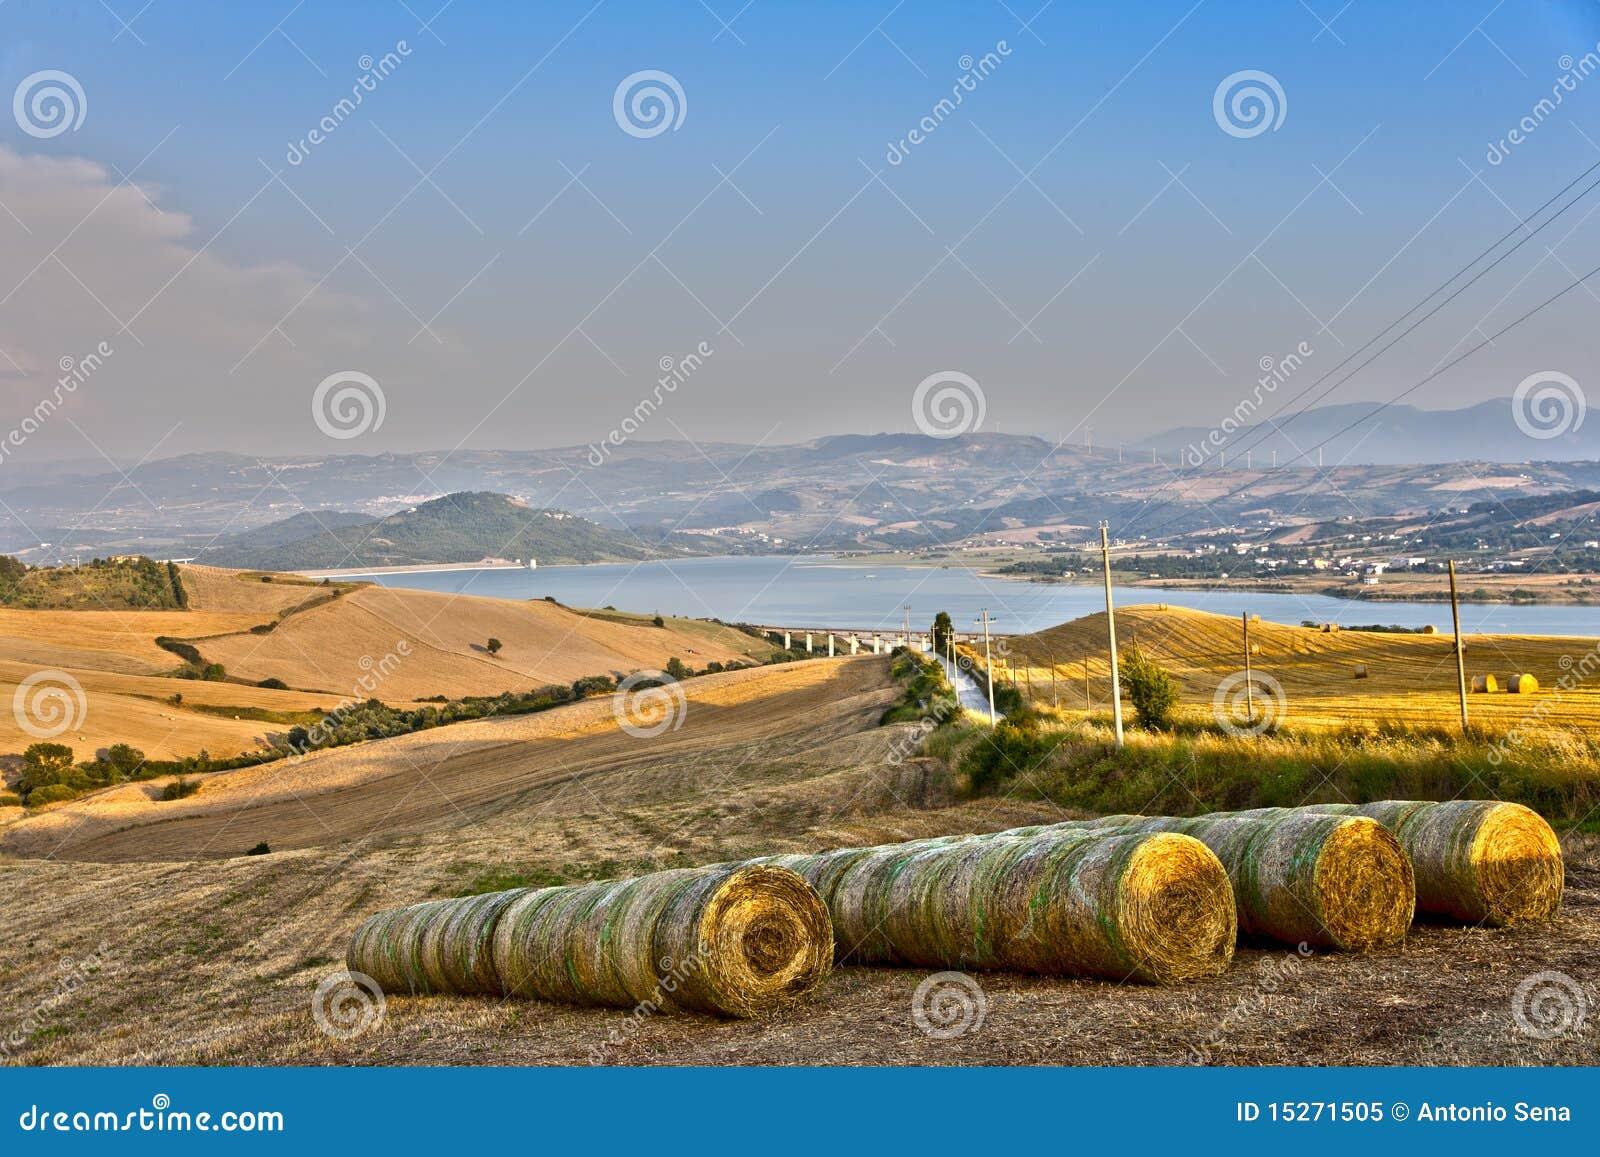 bamboo farm business plan